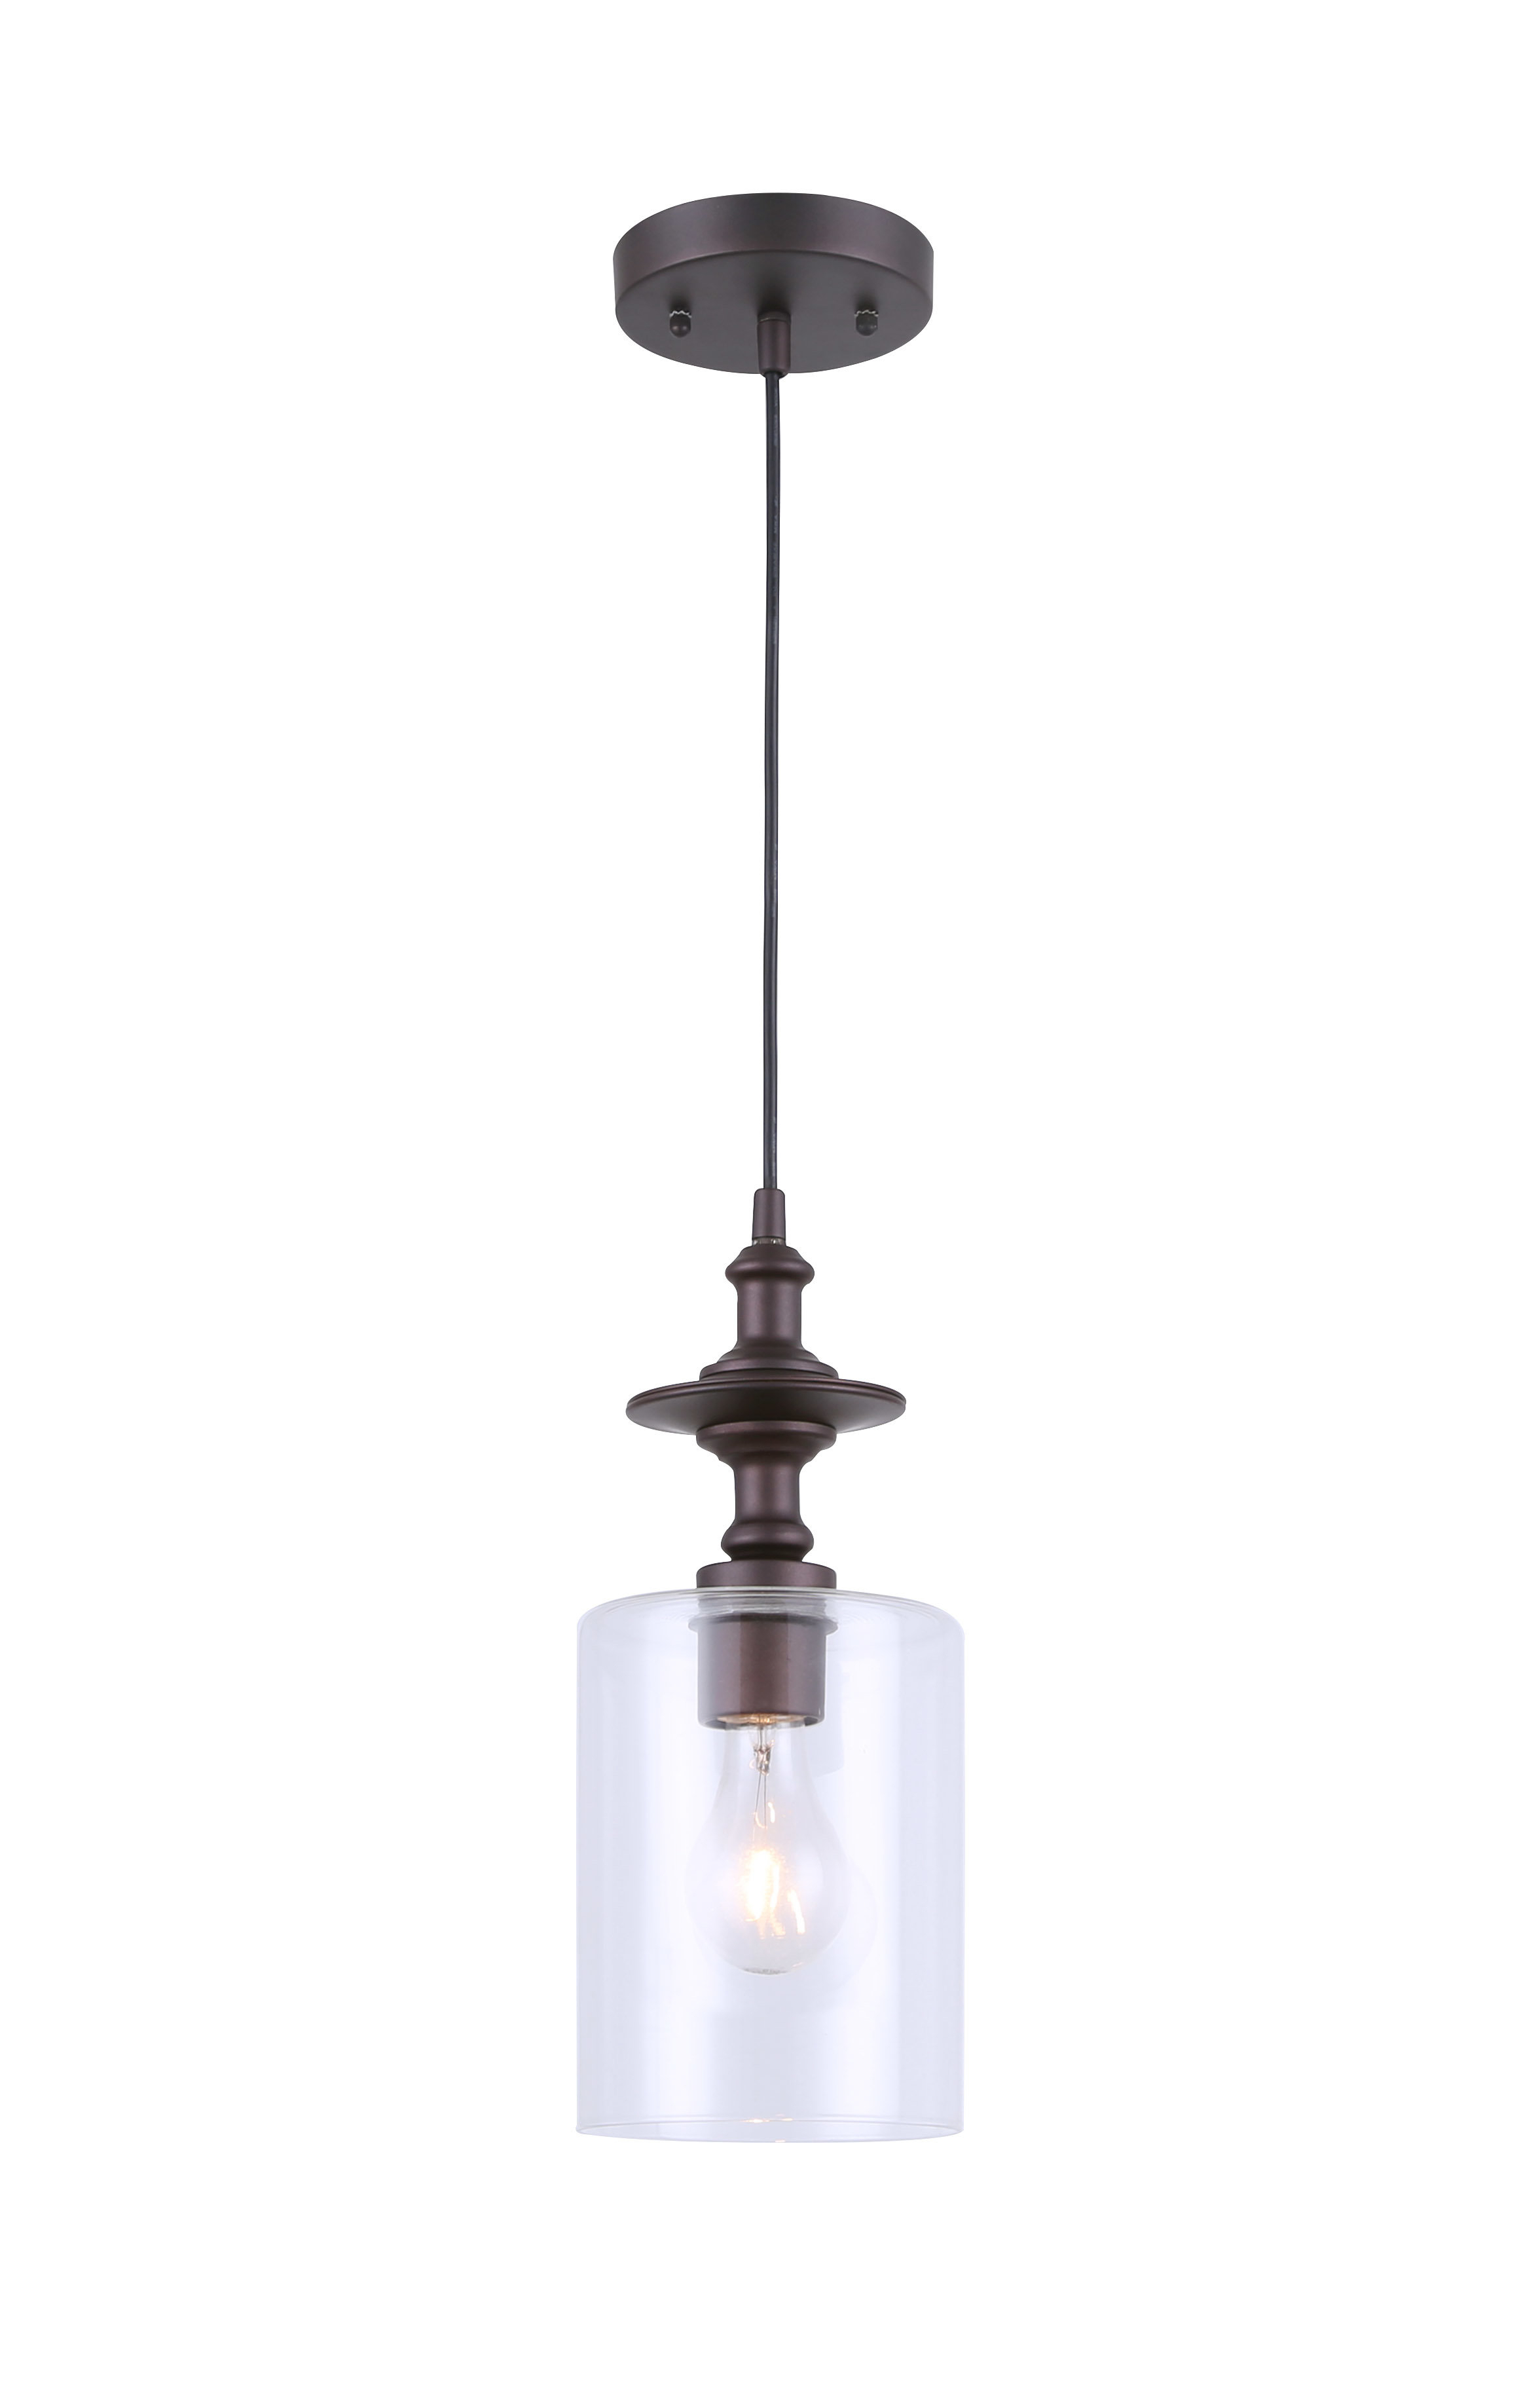 Wayfair Pertaining To 2019 Oldbury 1 Light Single Cylinder Pendants (View 17 of 20)